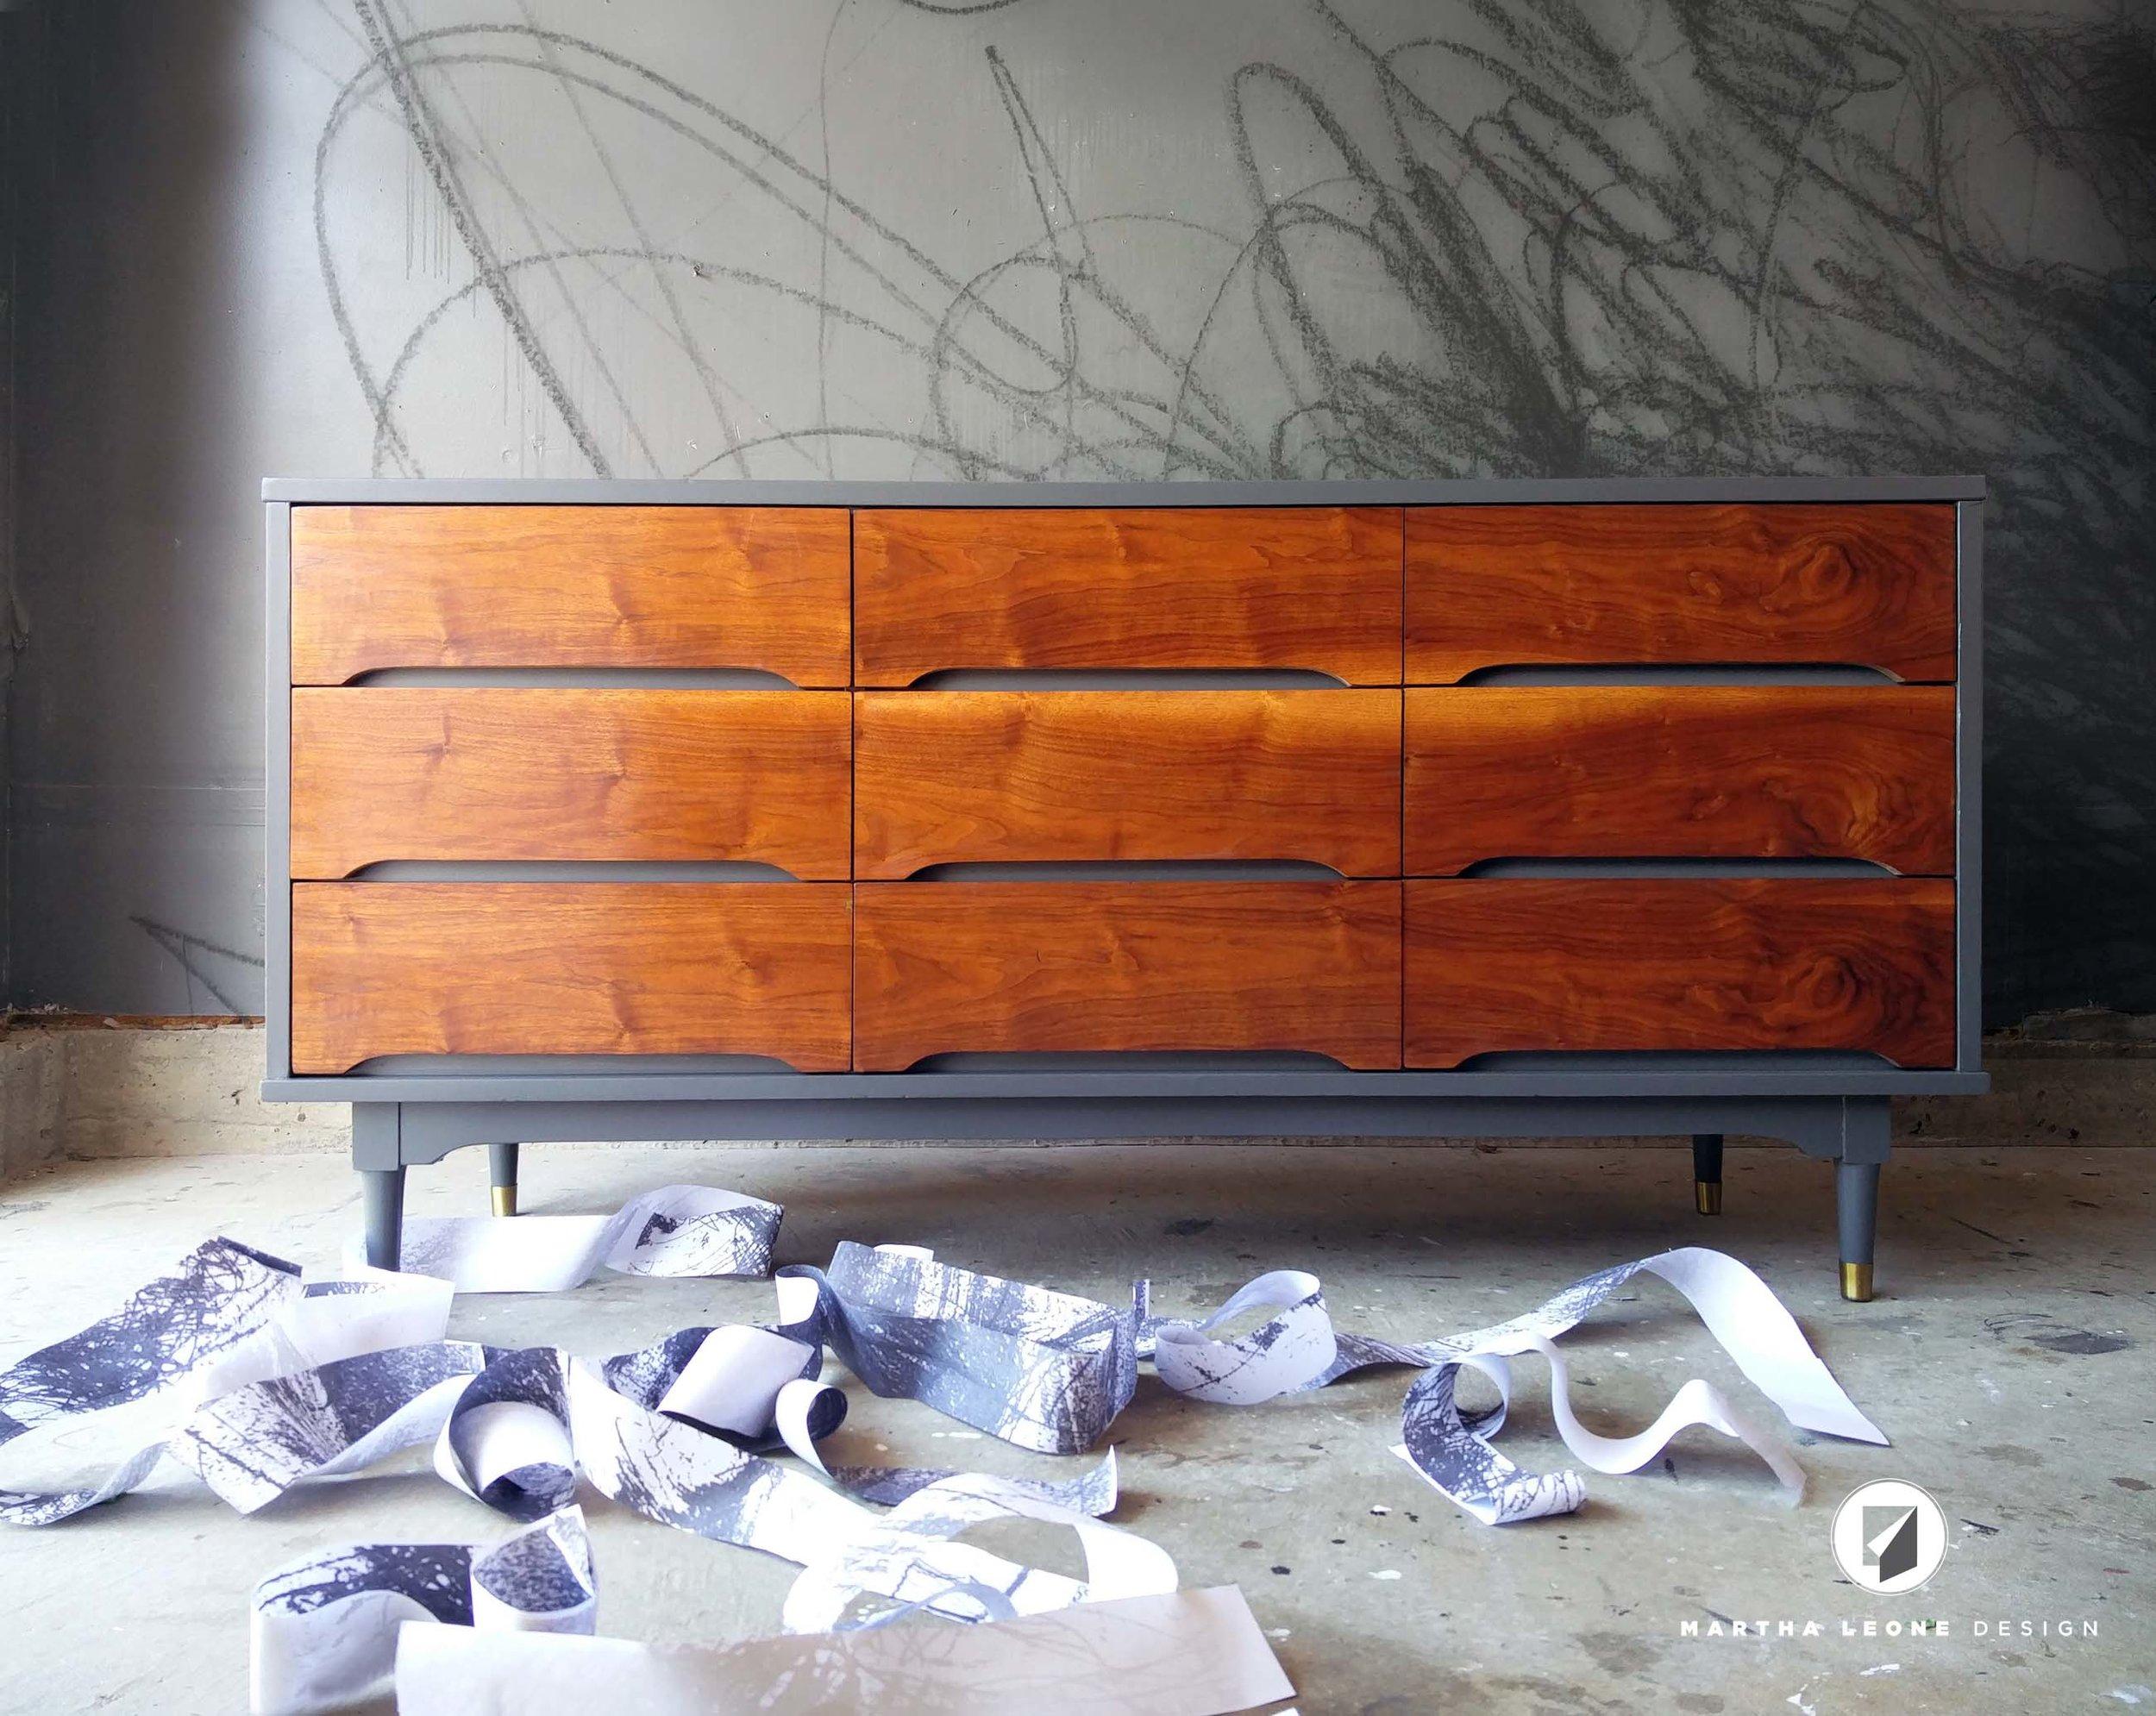 For    Safferstone Interiors & Design